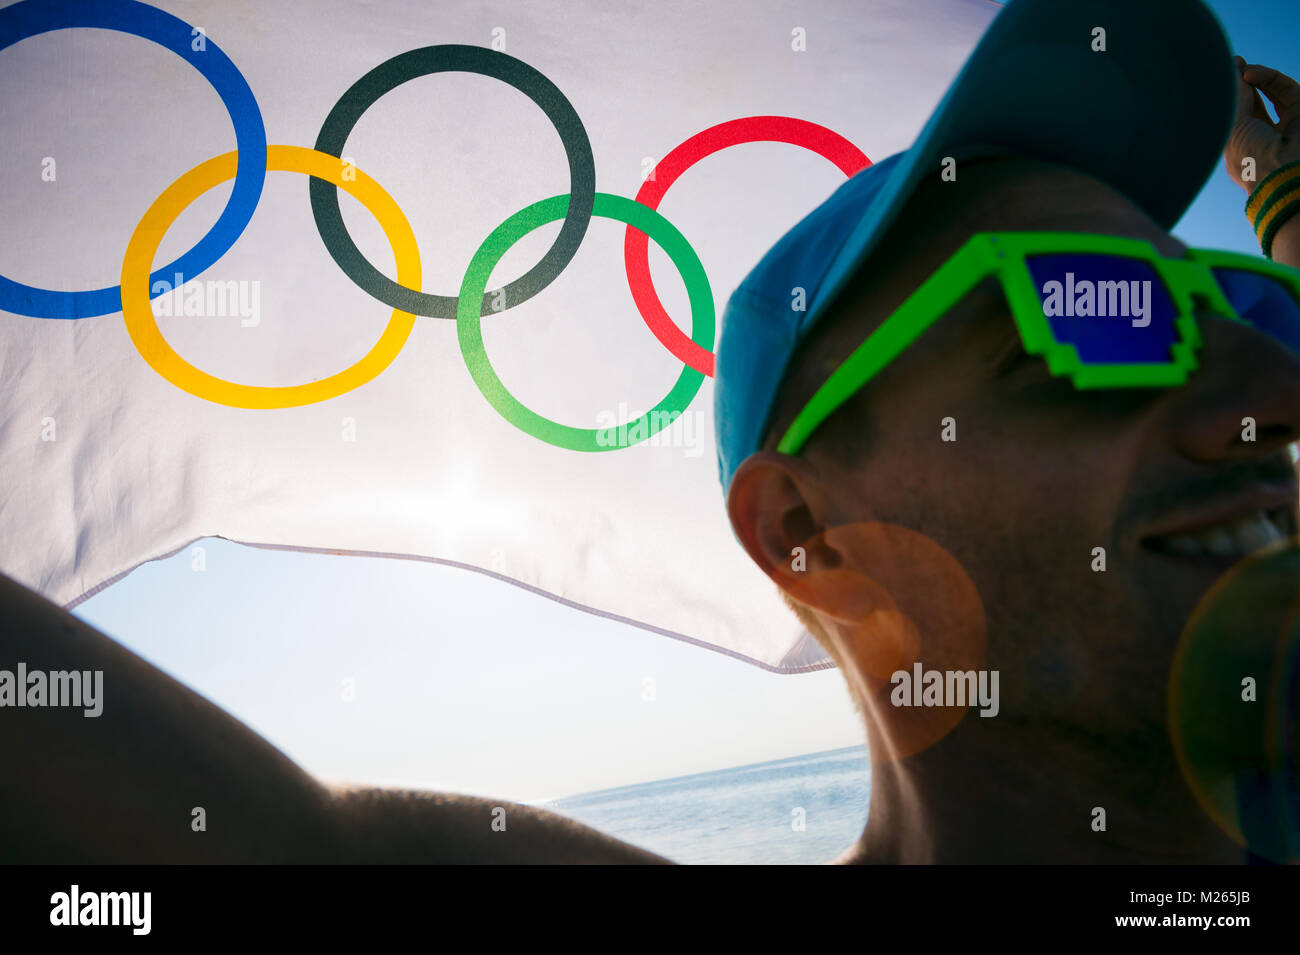 RIO DE JANEIRO - MARCH 10, 2016: Illustrative editorial of smiling Brazilian athlete holding Olympic flag at sunrise - Stock Image